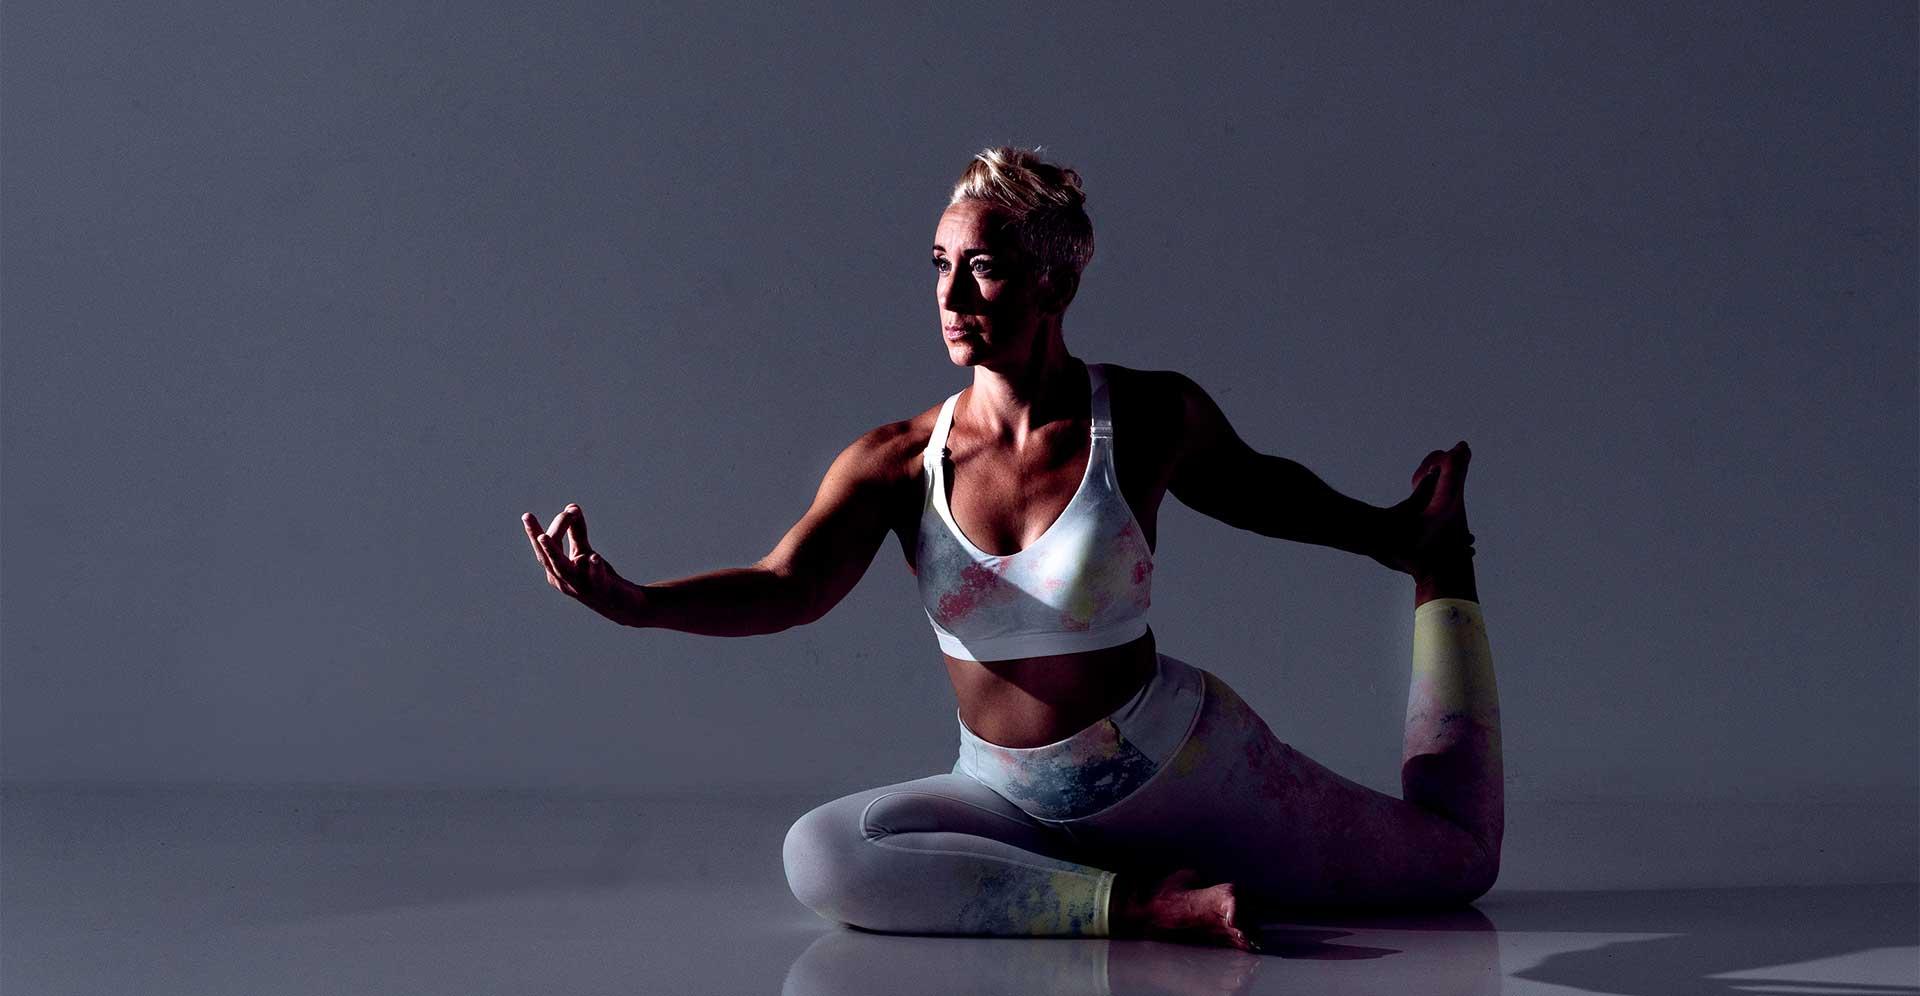 Kelly Whalen yoga pose at Supply Studio